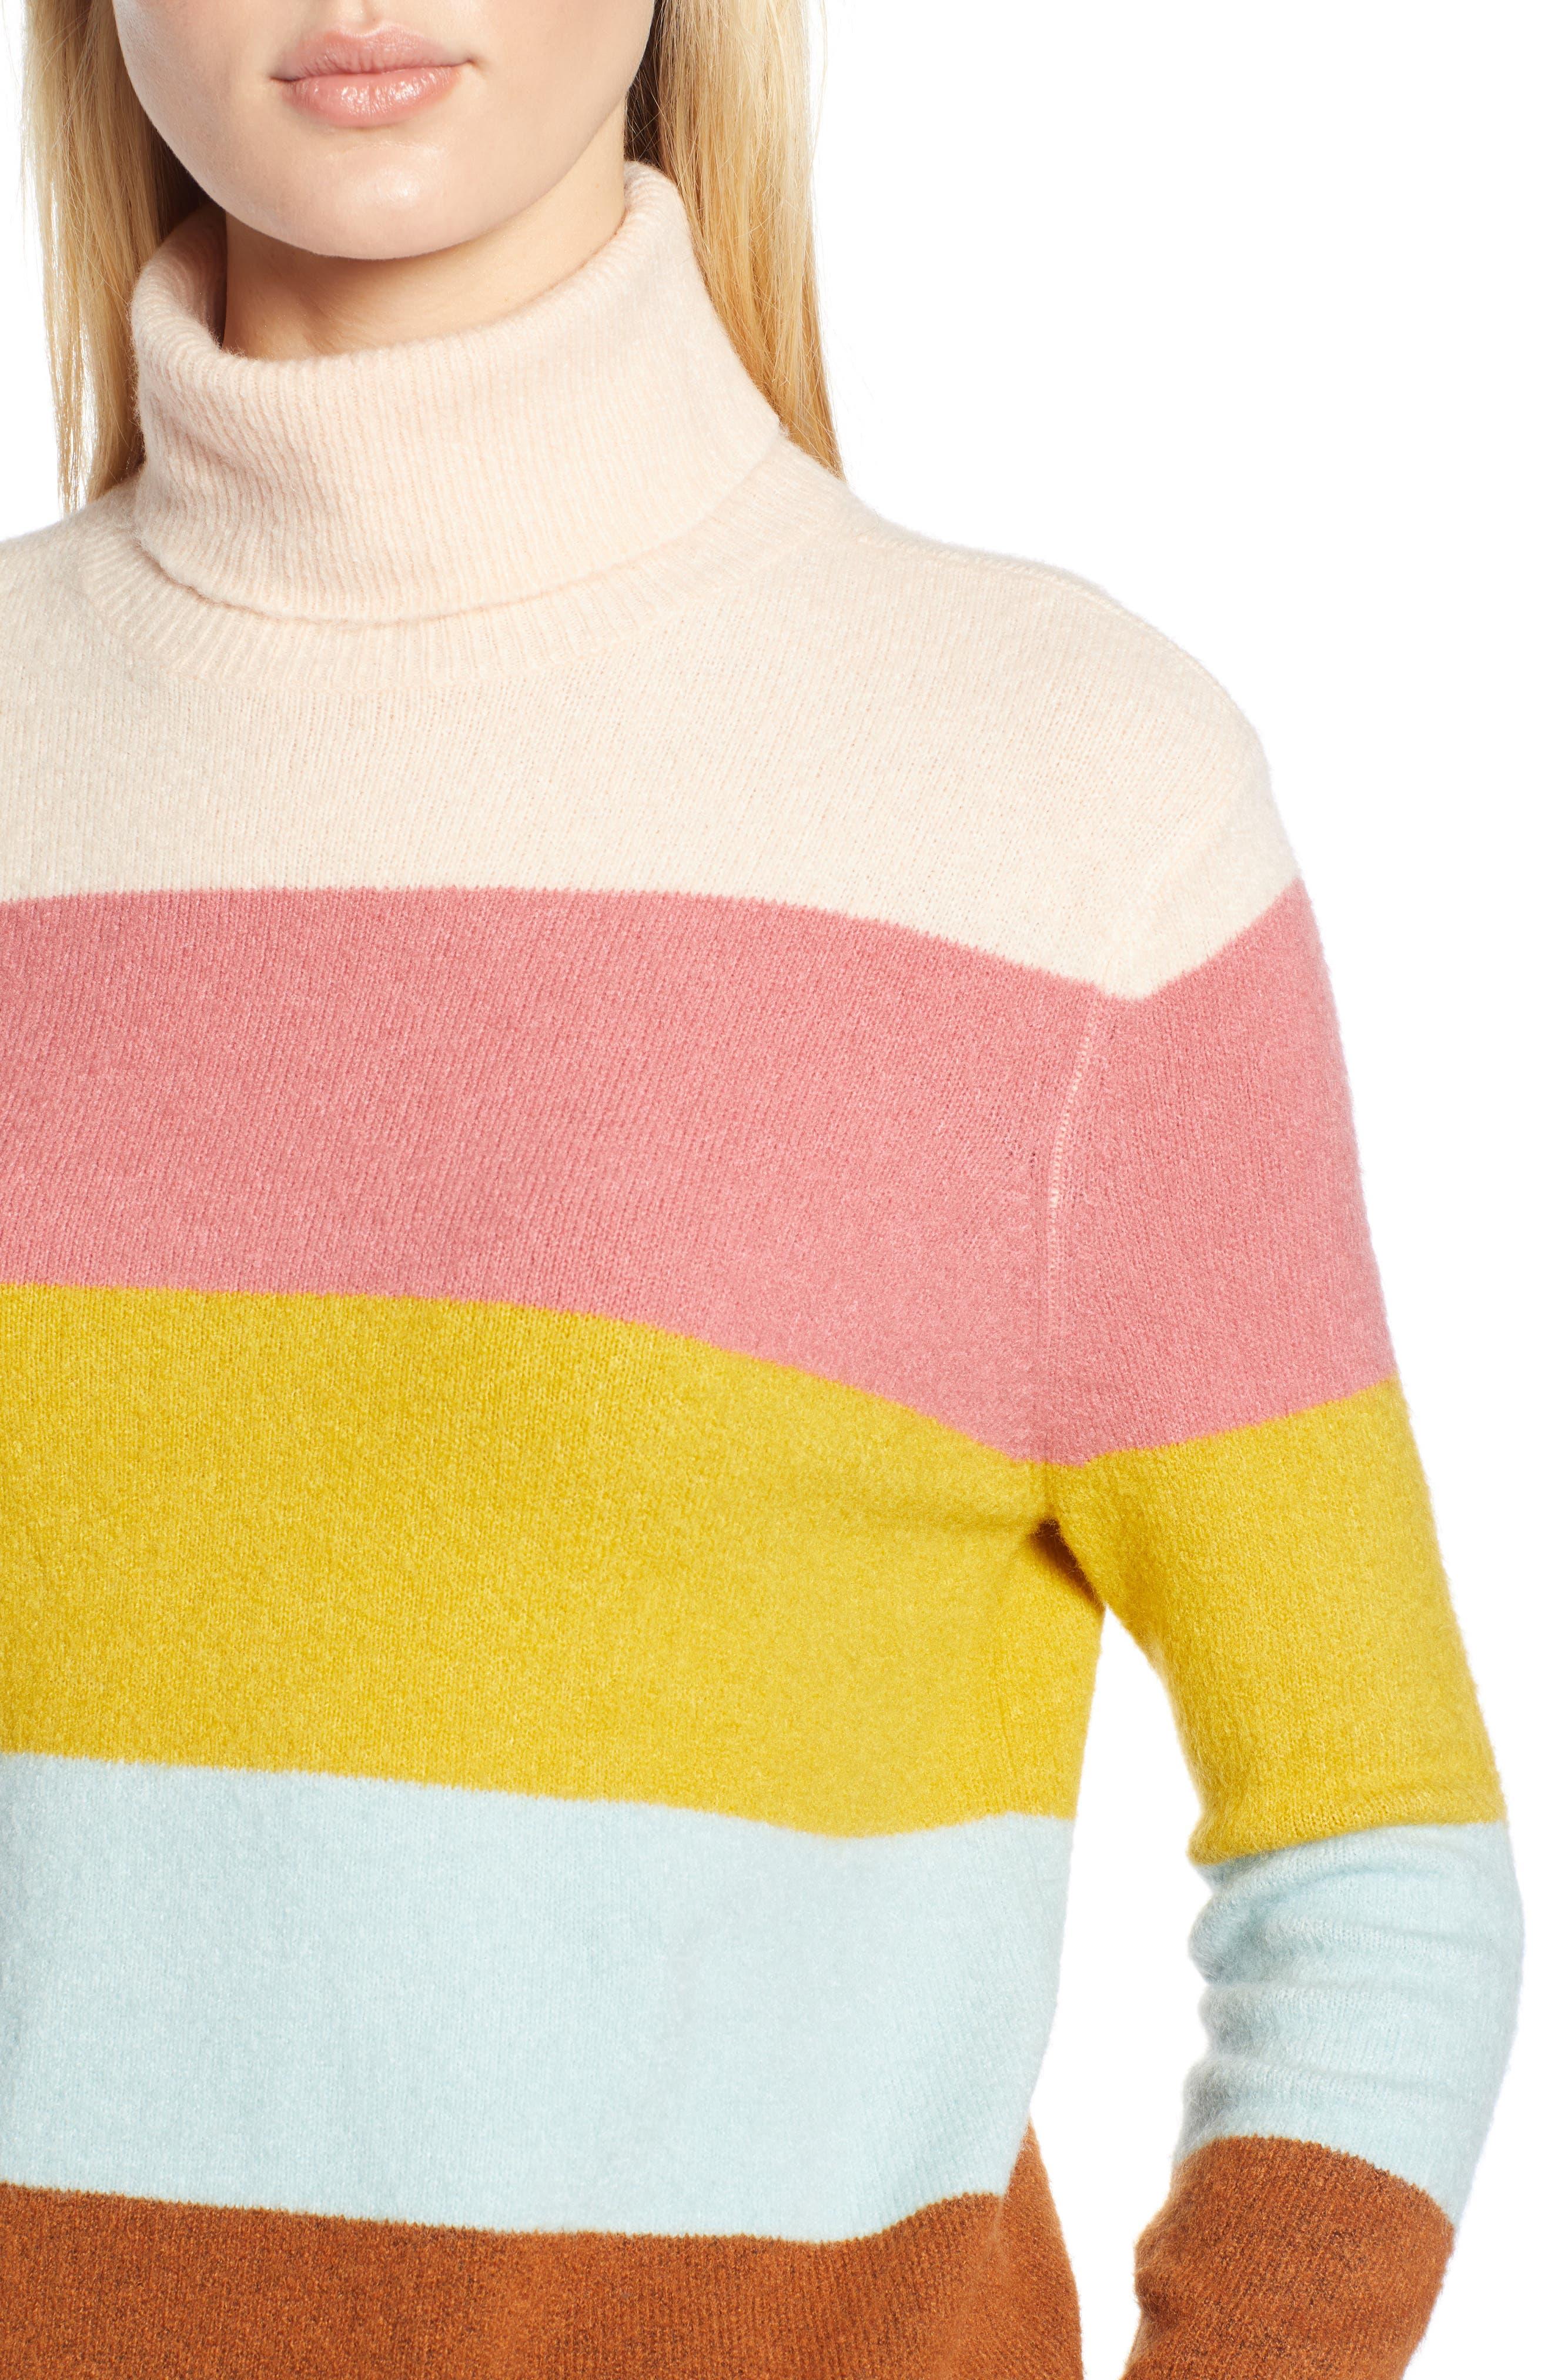 x Atlantic-Pacific Stripe Turtleneck Sweater,                             Alternate thumbnail 5, color,                             PINK MULTI STRIPE